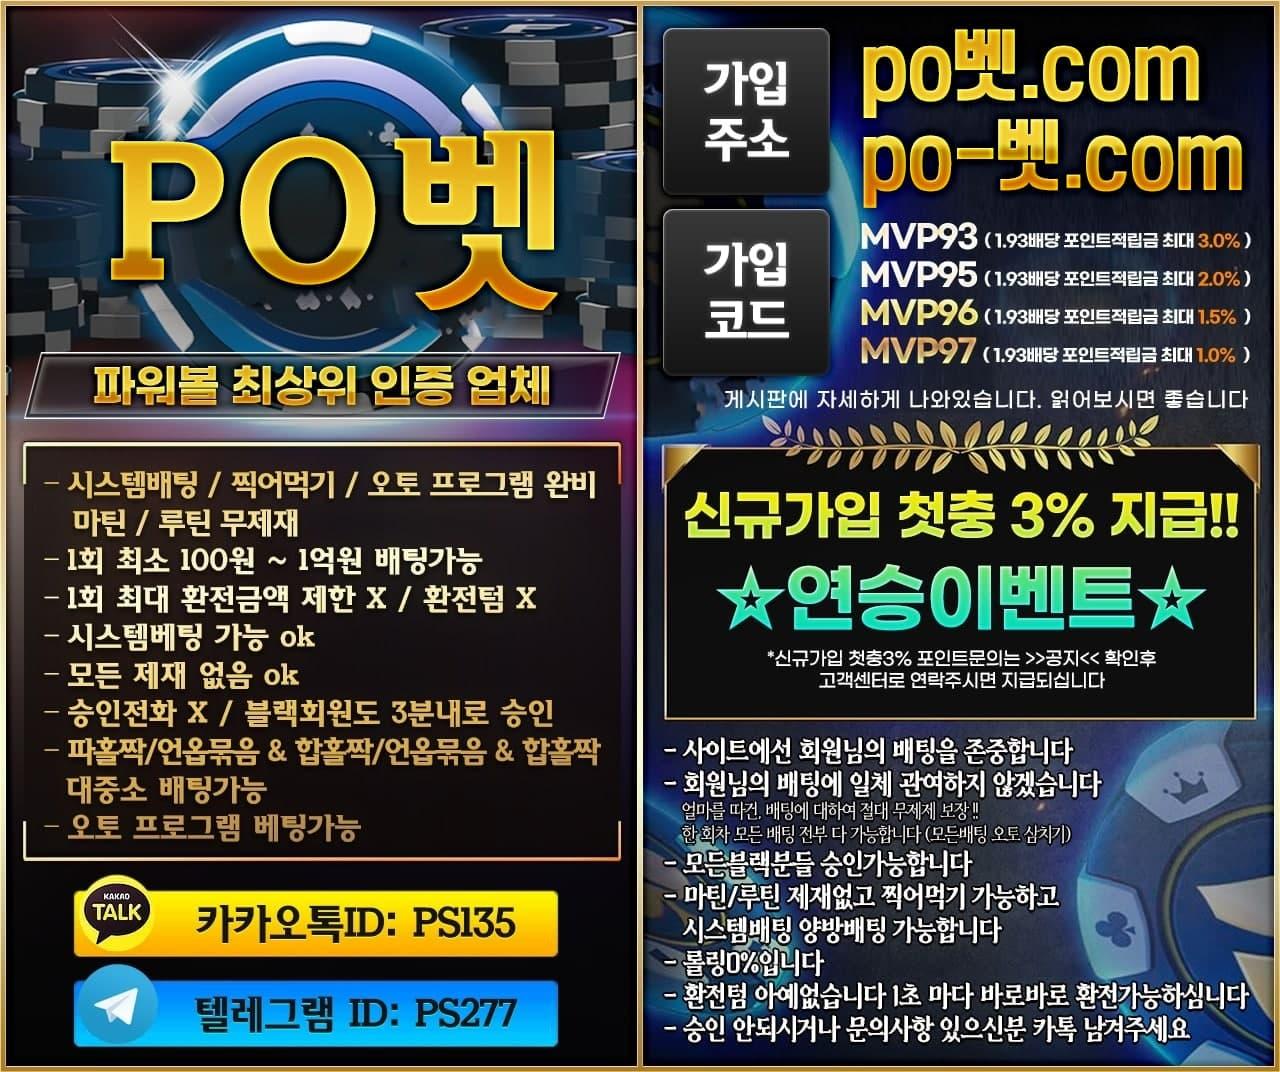 photo_2021-06-11_12-20-10.jpg